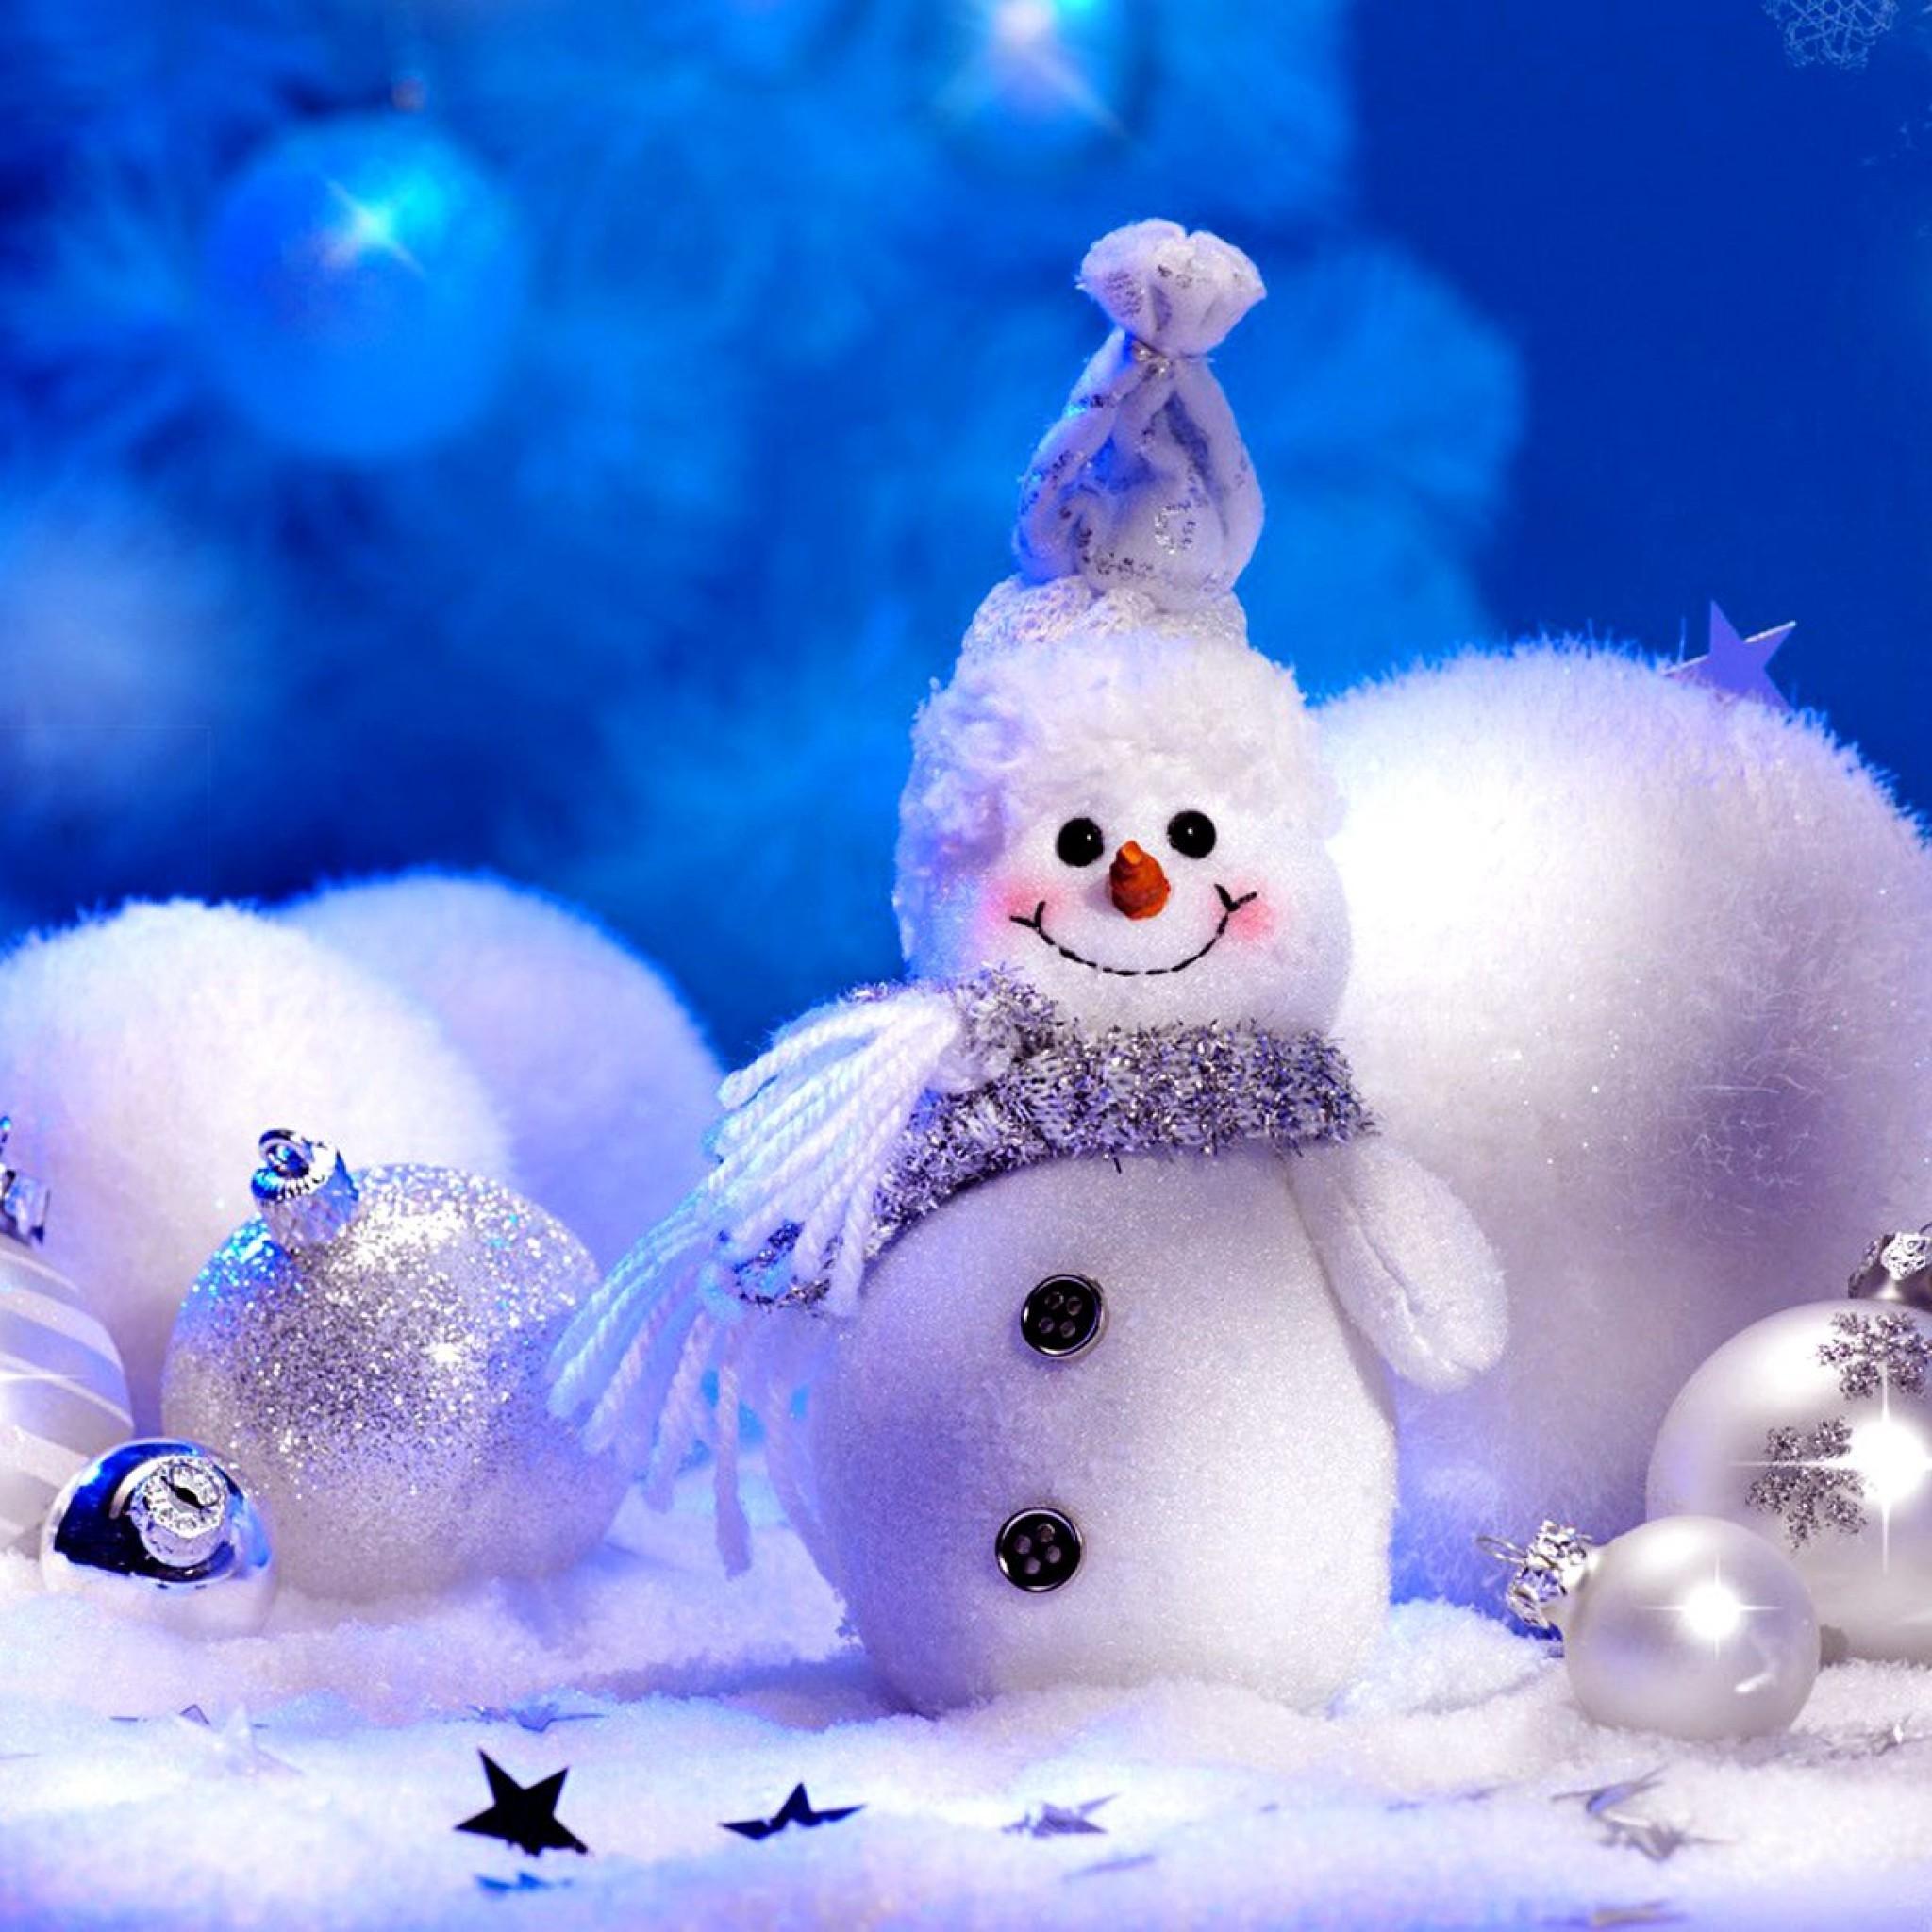 Ipad Air Christmas Wallpaper | Hd Wallpapers Download